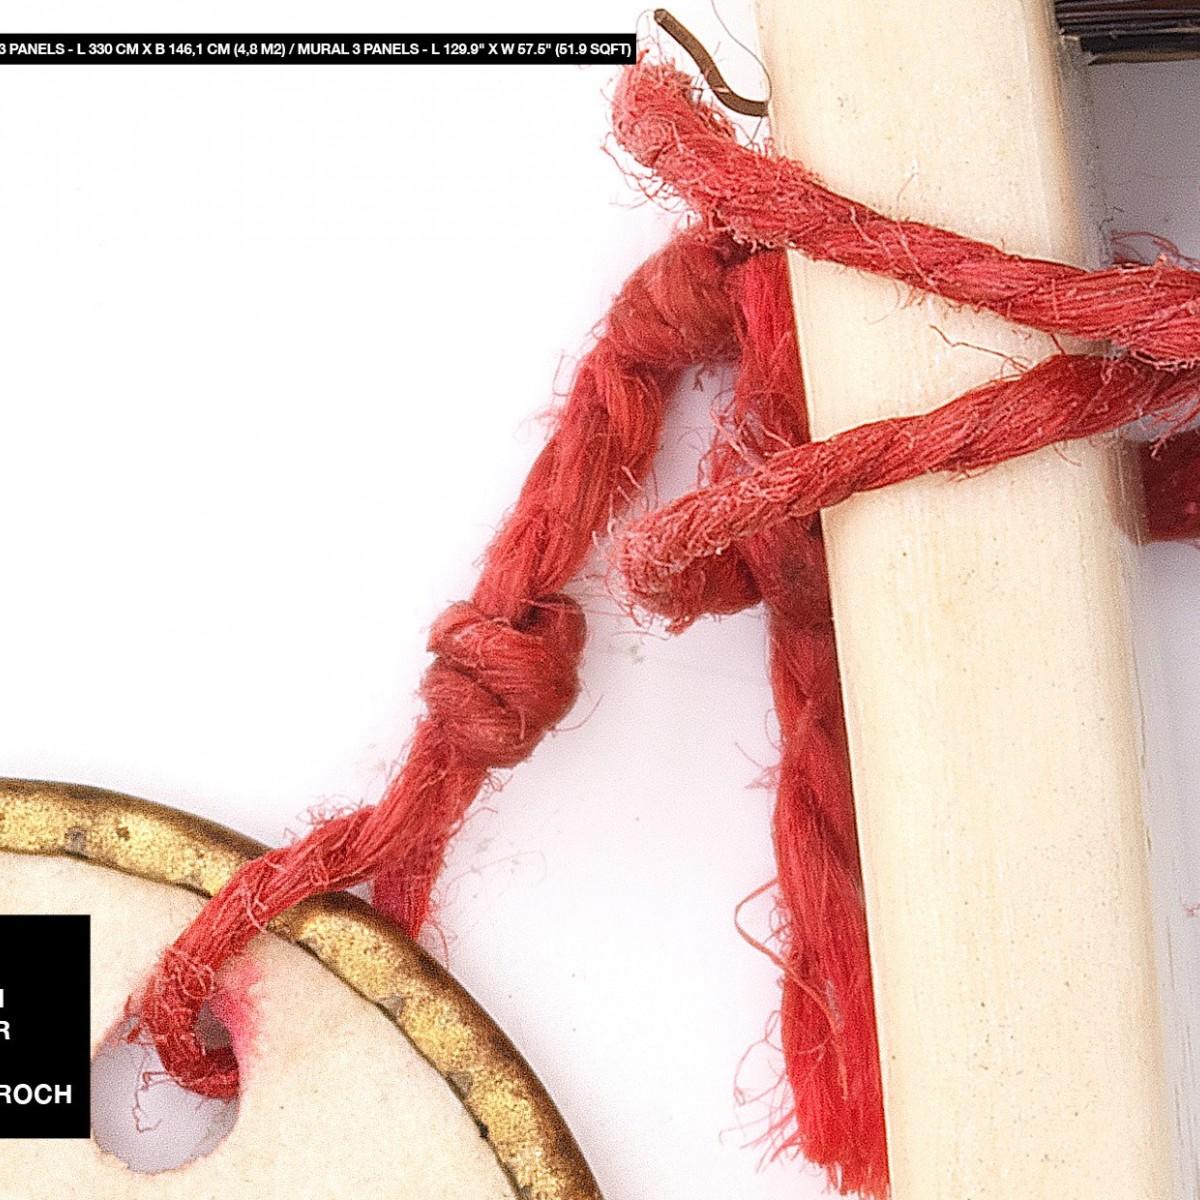 Tapet designer Obsession -  BRUSHES XL by Daniel Rozensztroch, DRO-04, NLXL, 4.8mp / model